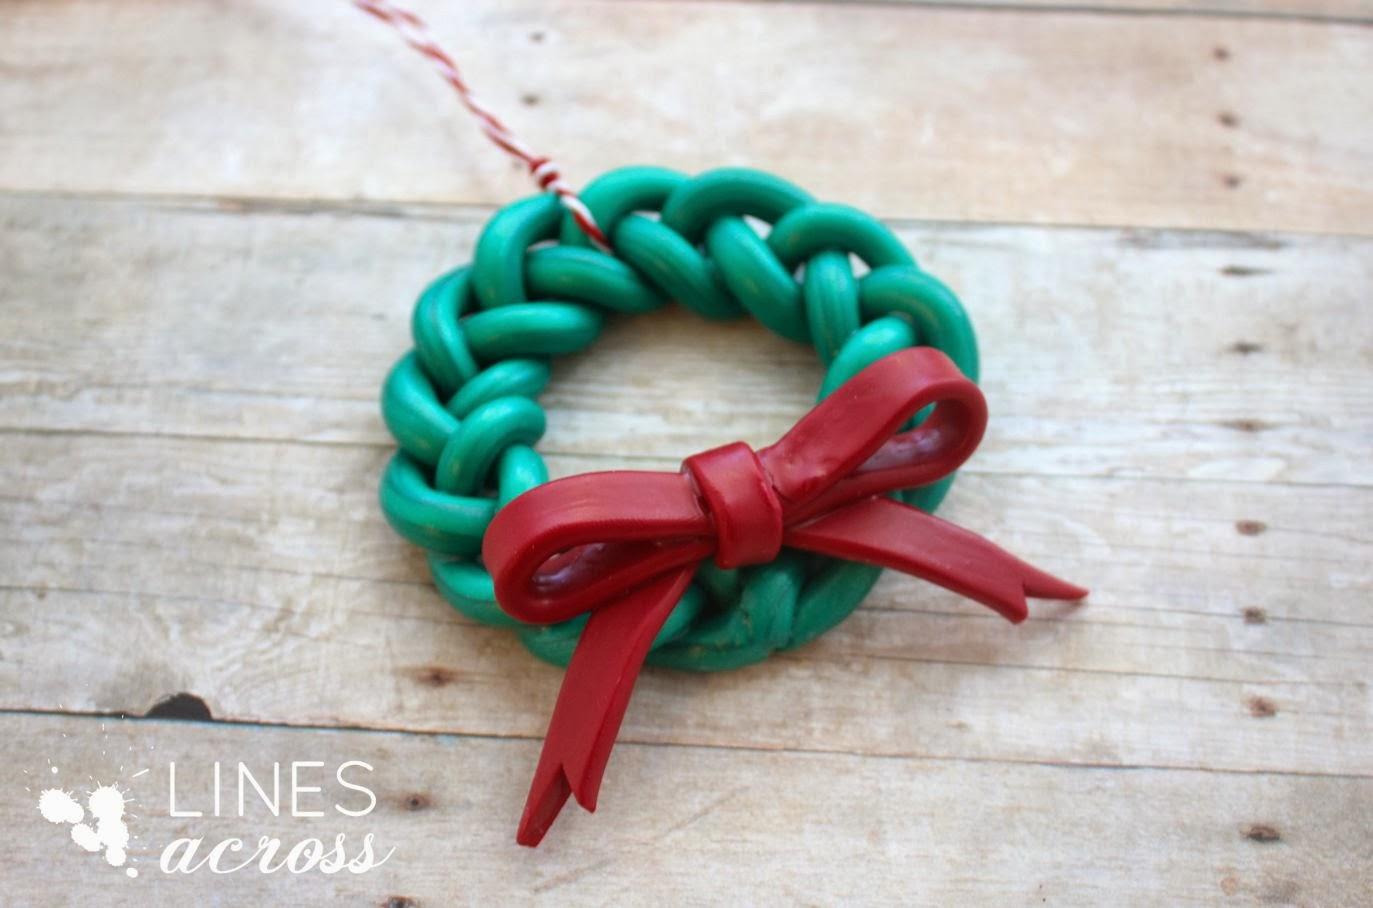 Handmade Braided Wreath Ornament - Lines Across